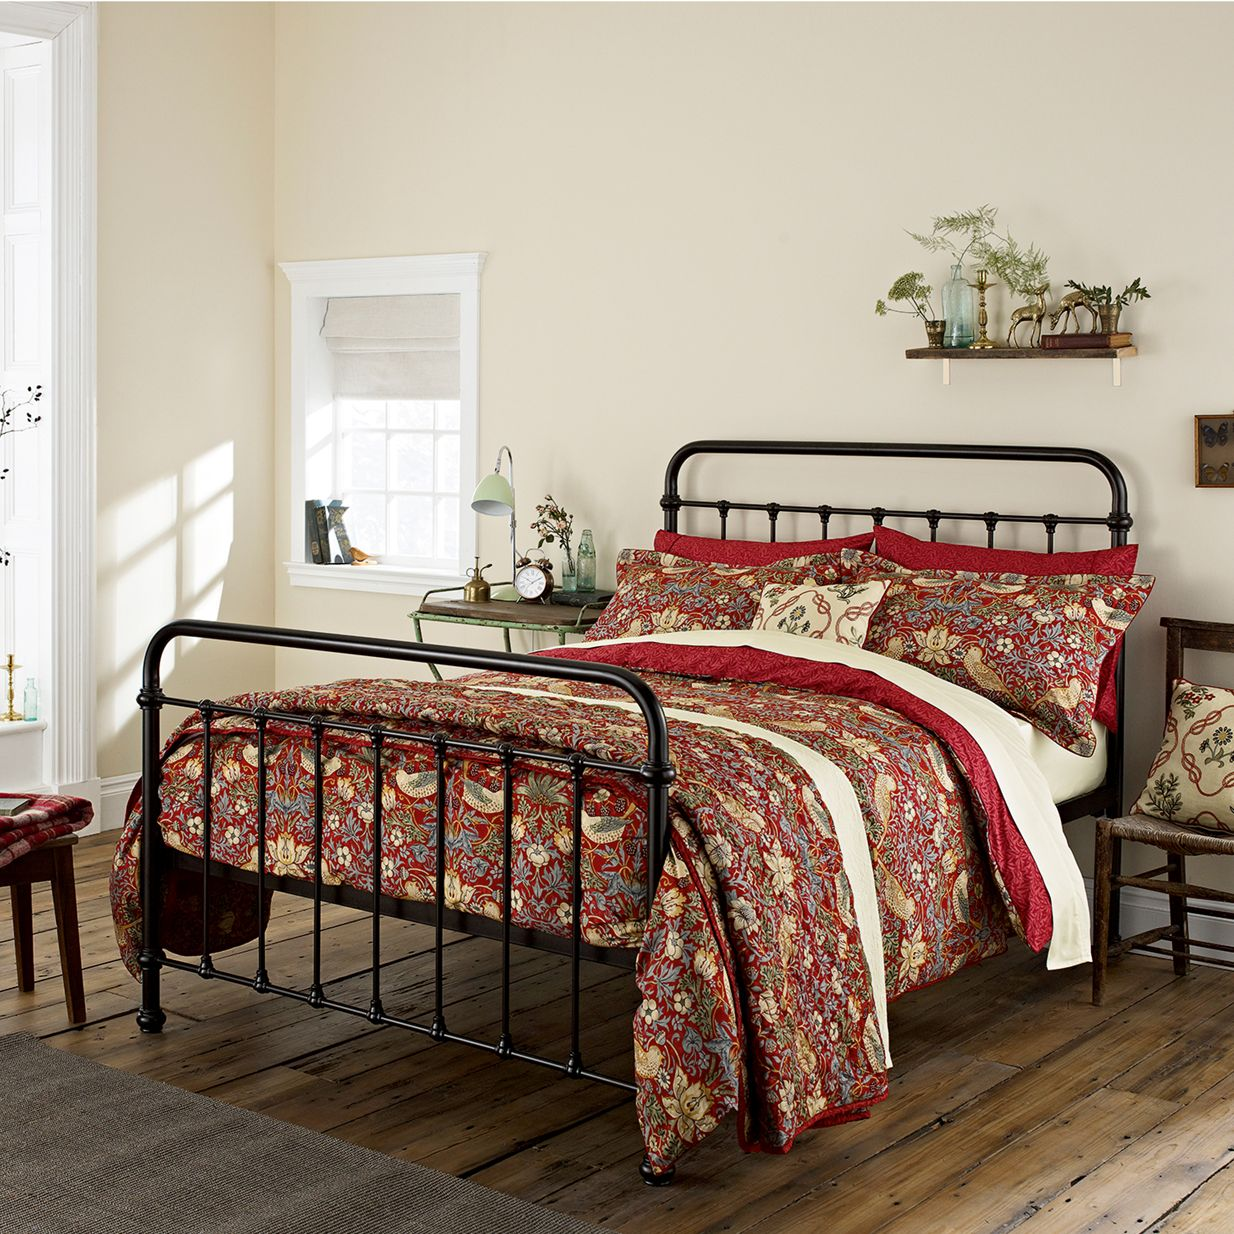 Morris & Co Morris & Co Strawberry Thief Bedding